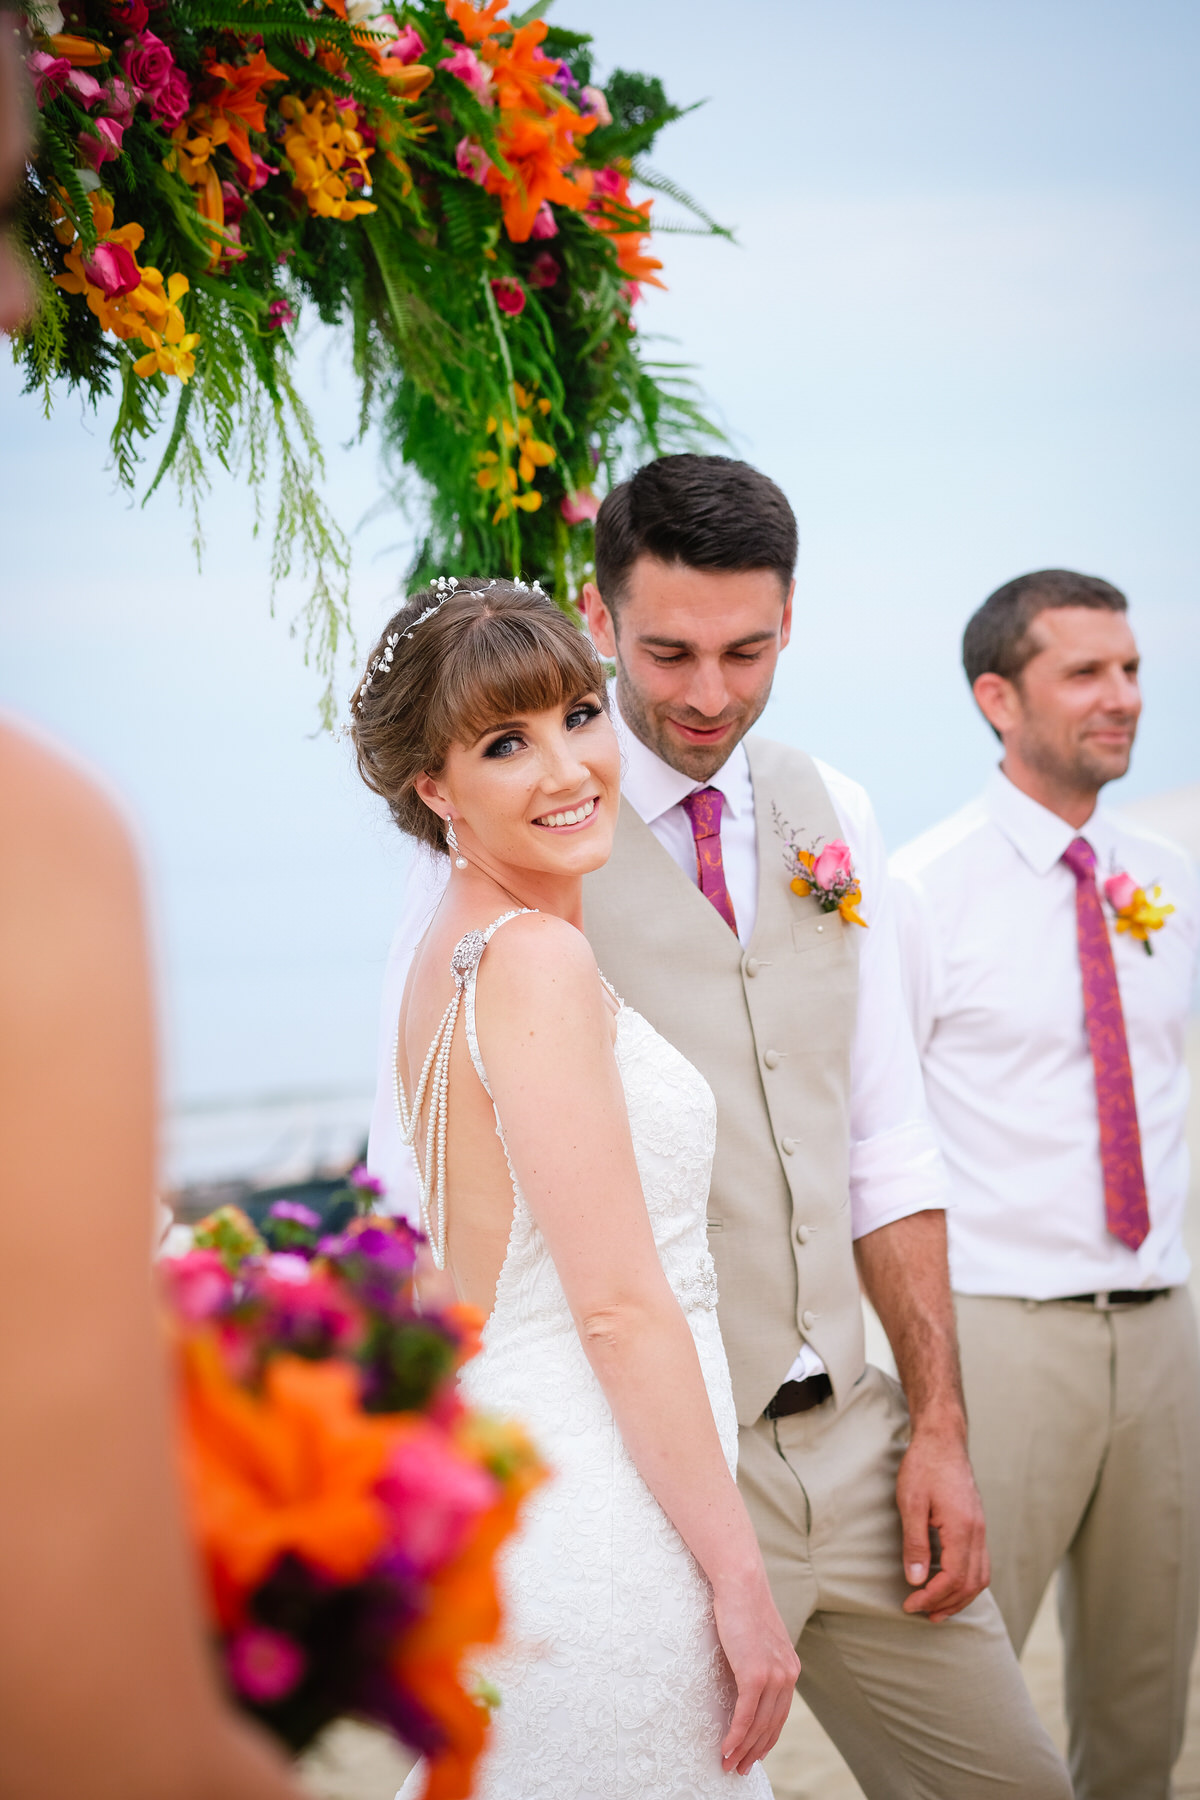 Vietnam-Danang-wedding-photographer-19.jpg